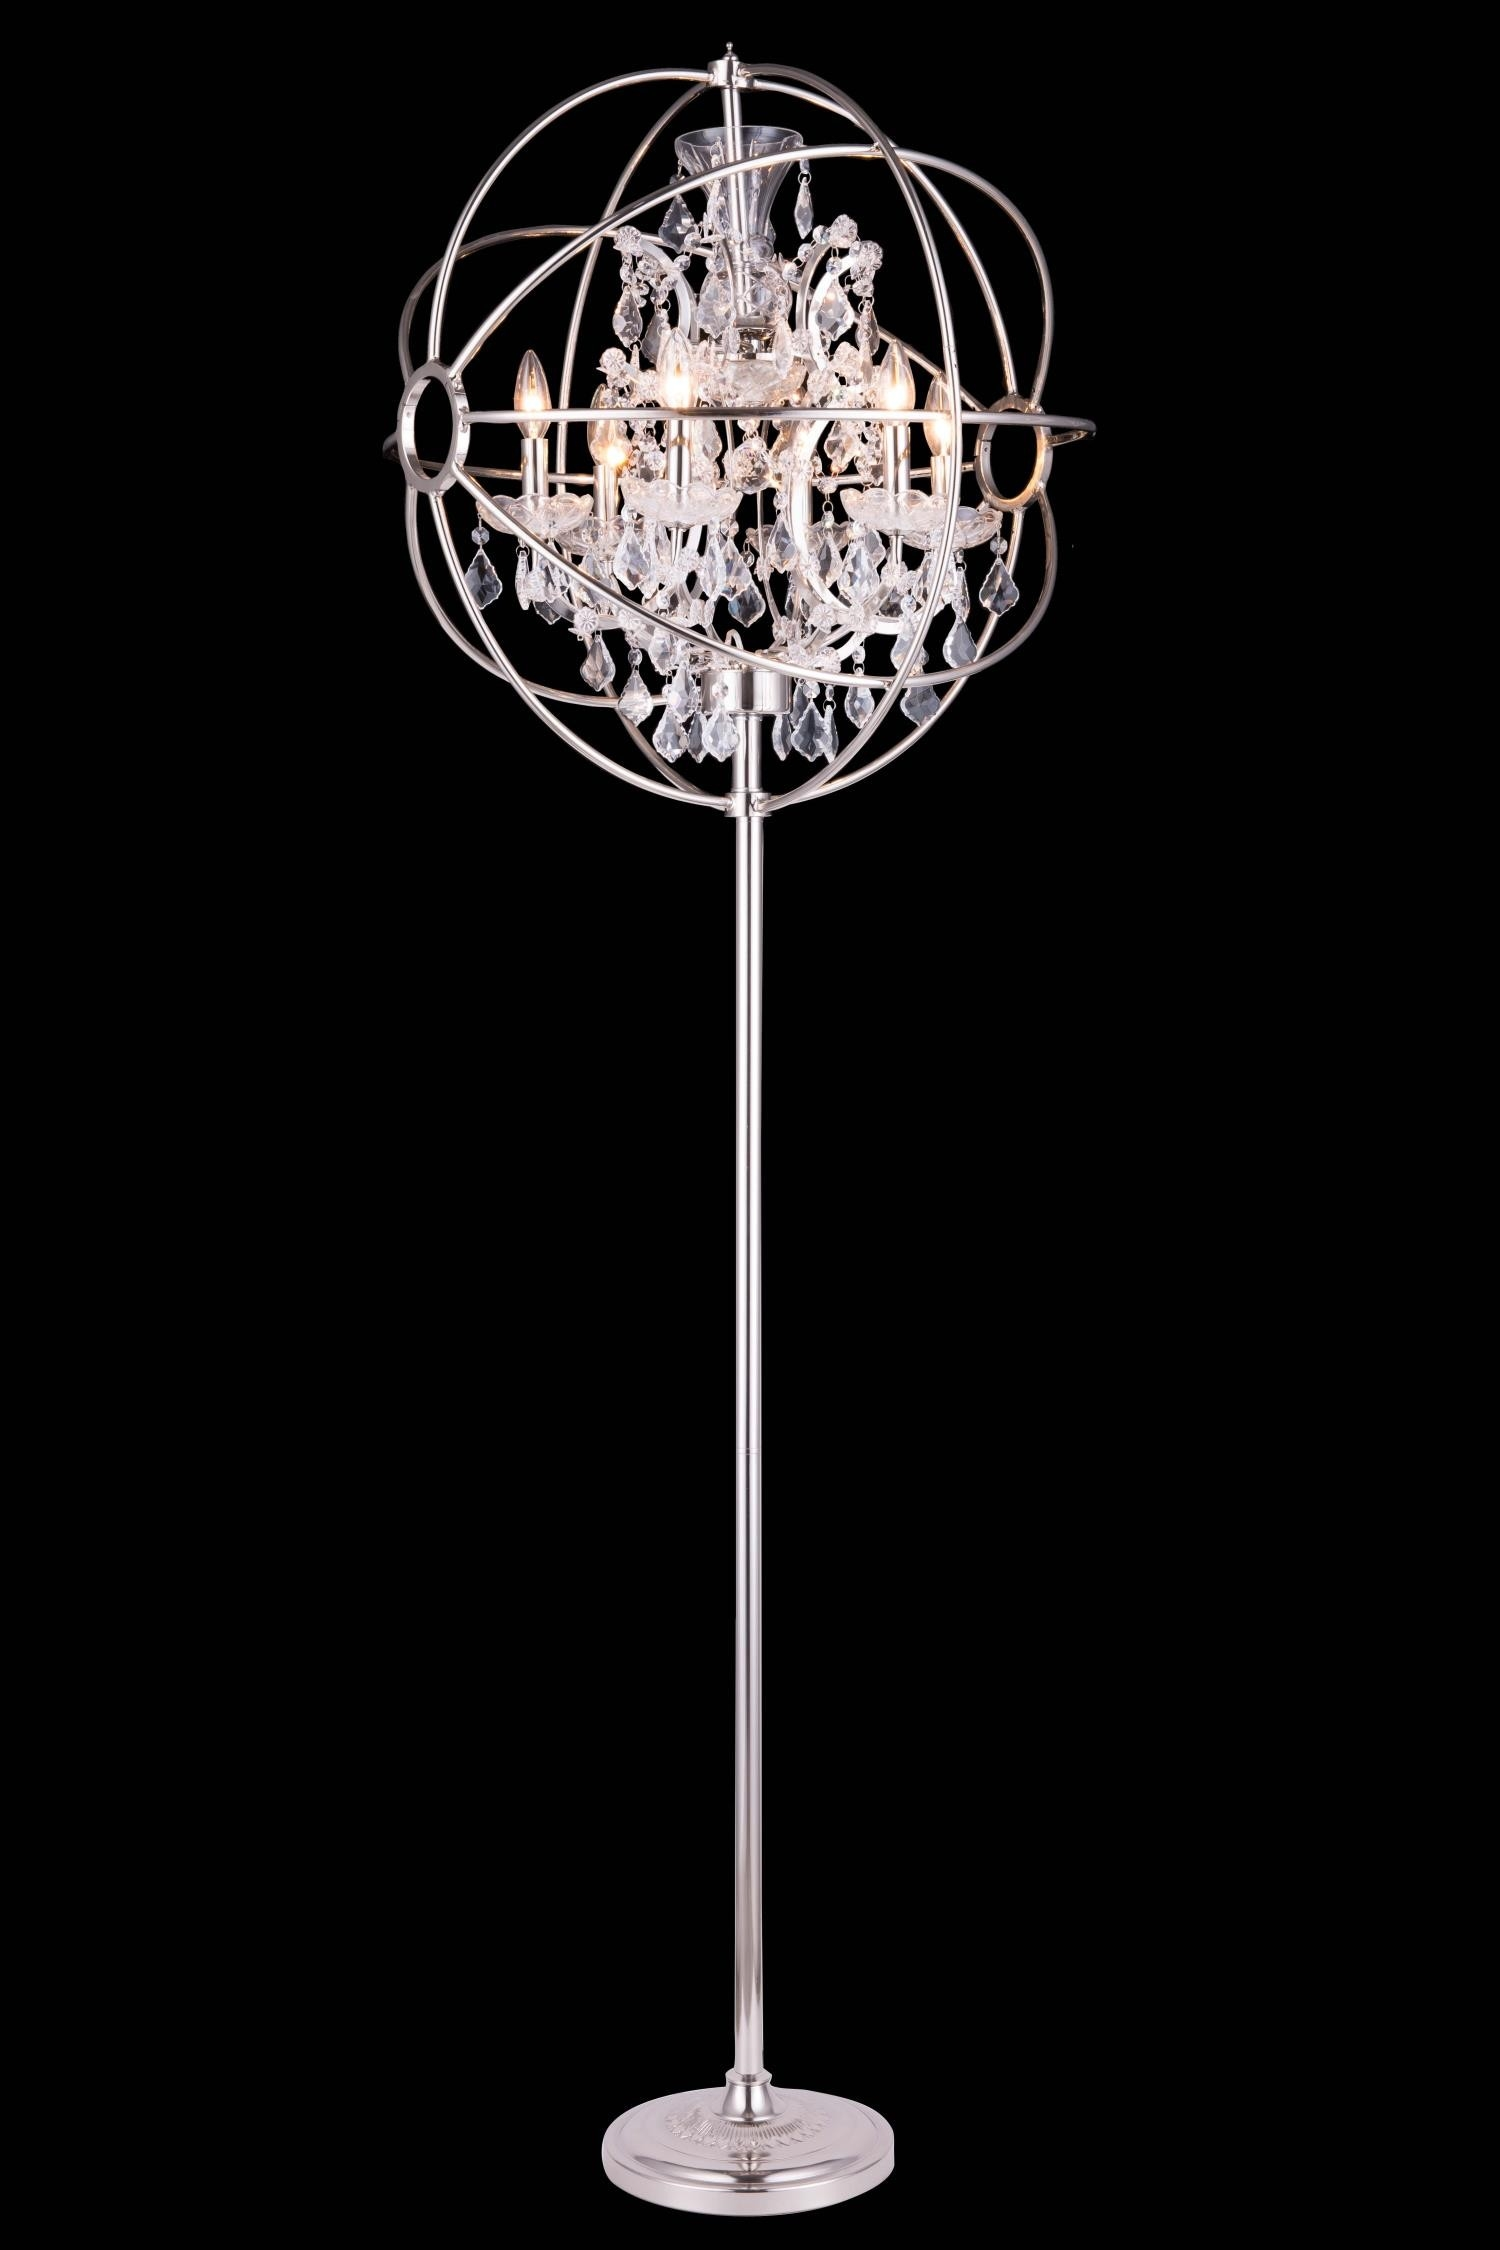 Lights Cool Floor Lamp Design With Luxury Crystal Floor Lamp Throughout Chandelier Standing Lamps (Image 16 of 25)